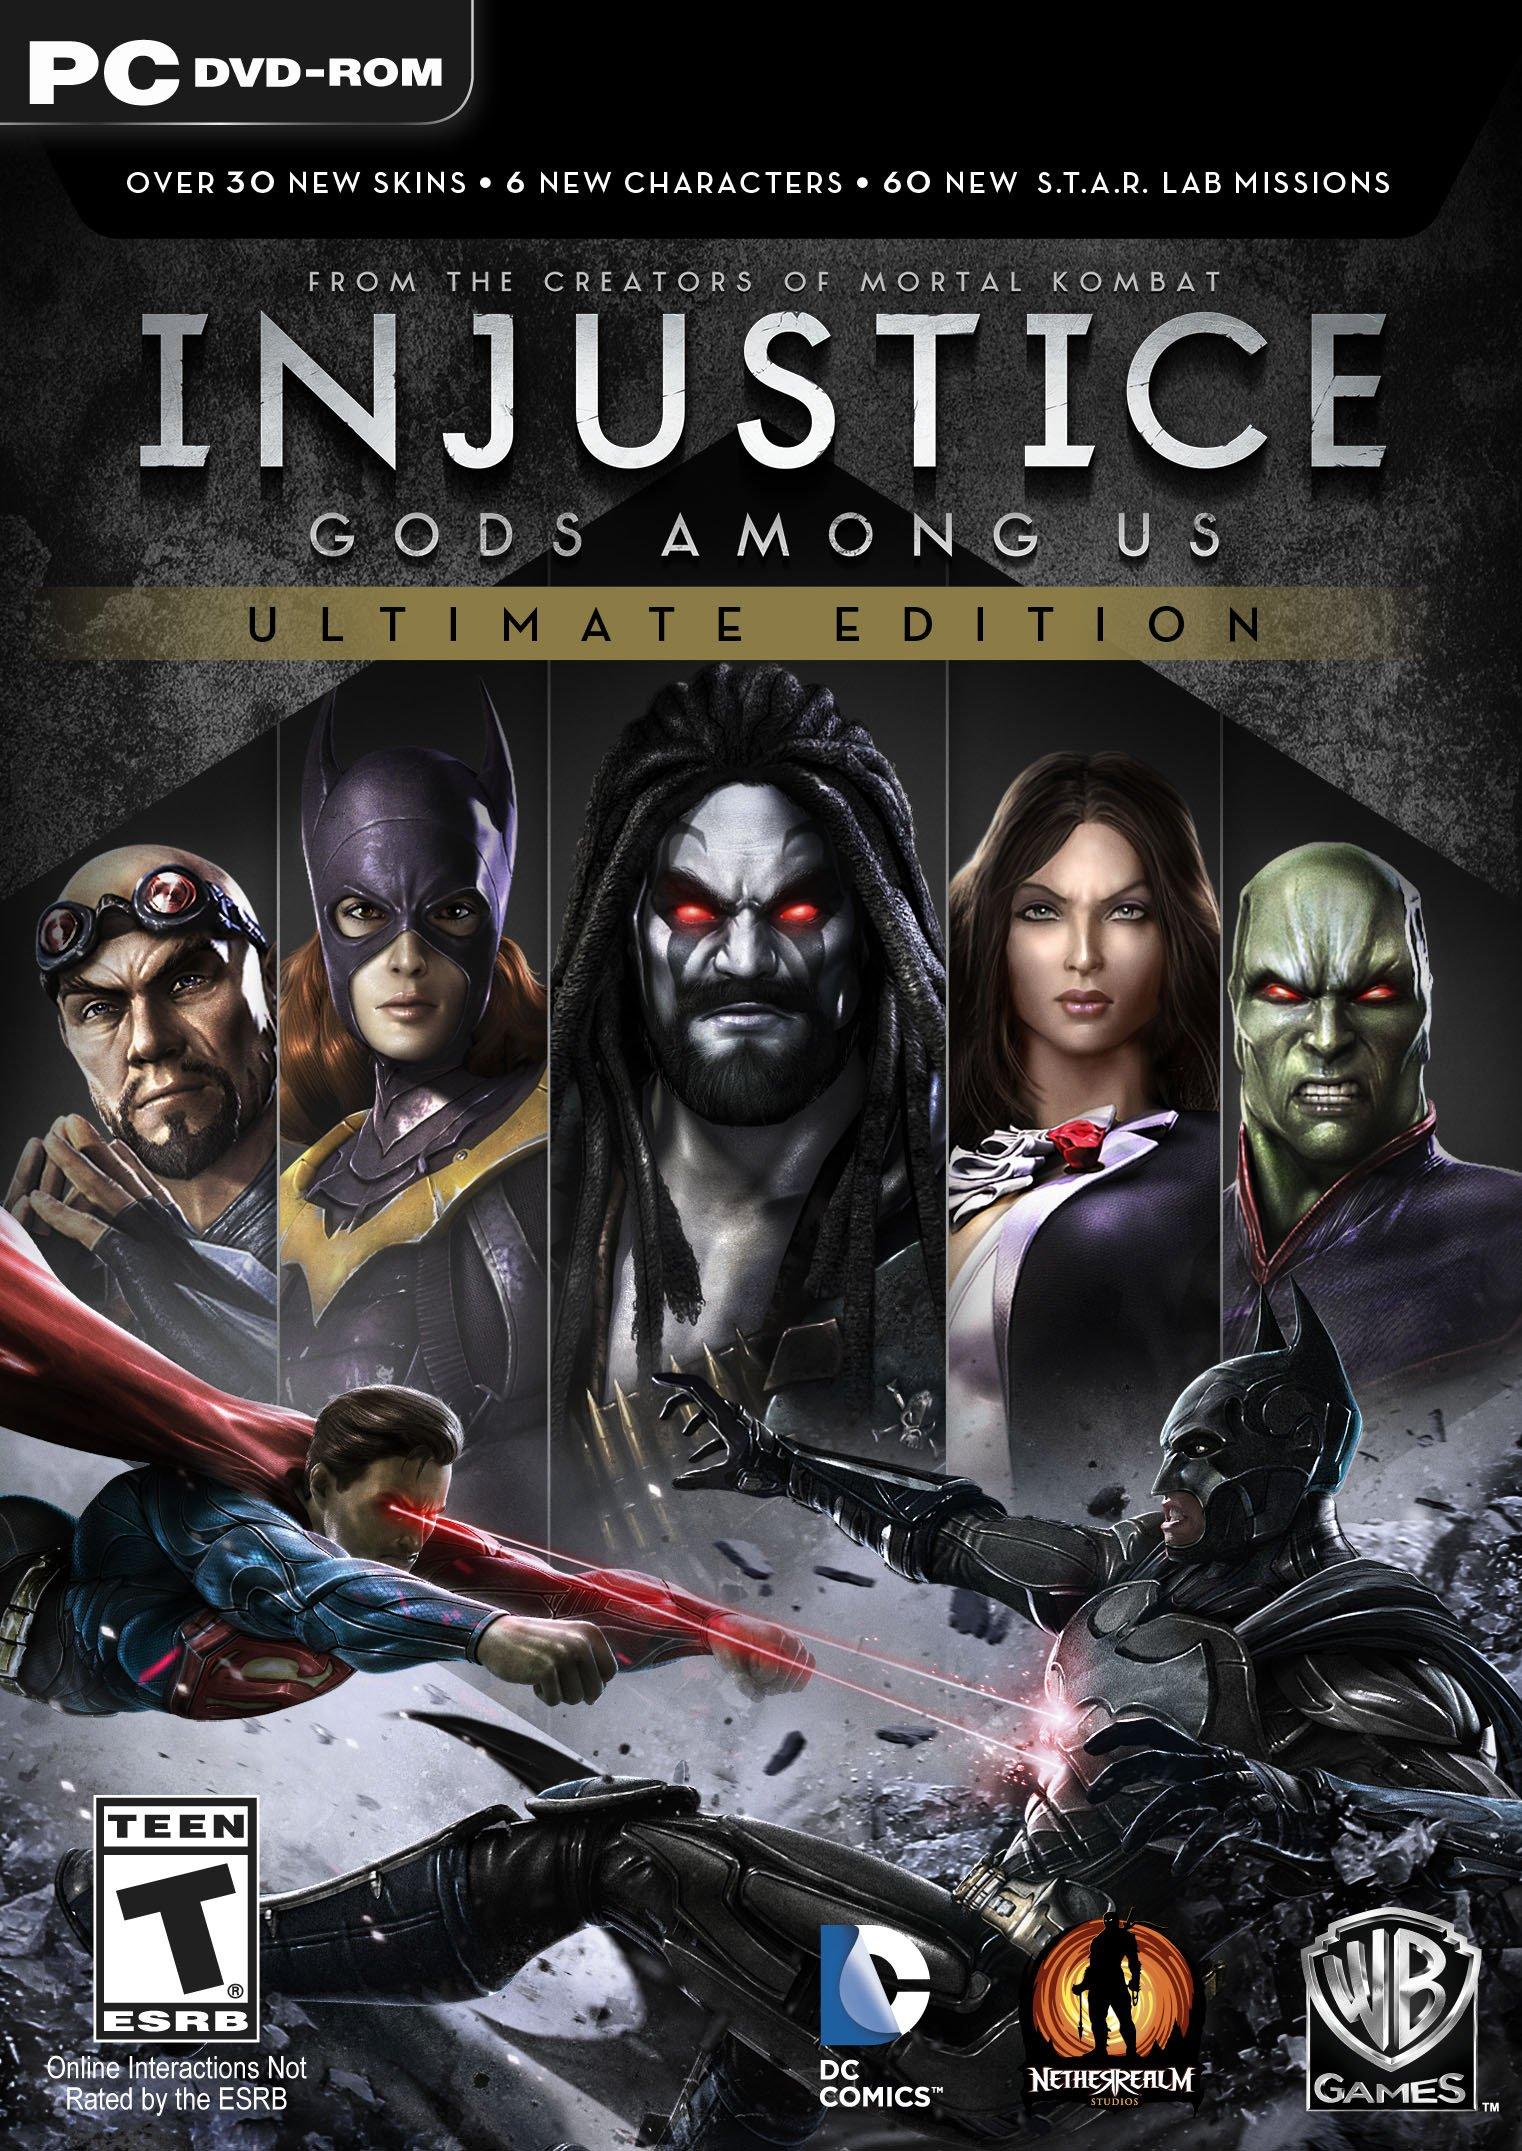 Injustice-LesDieuxSontParmiNousUltimateEdition PC Jaquette 002